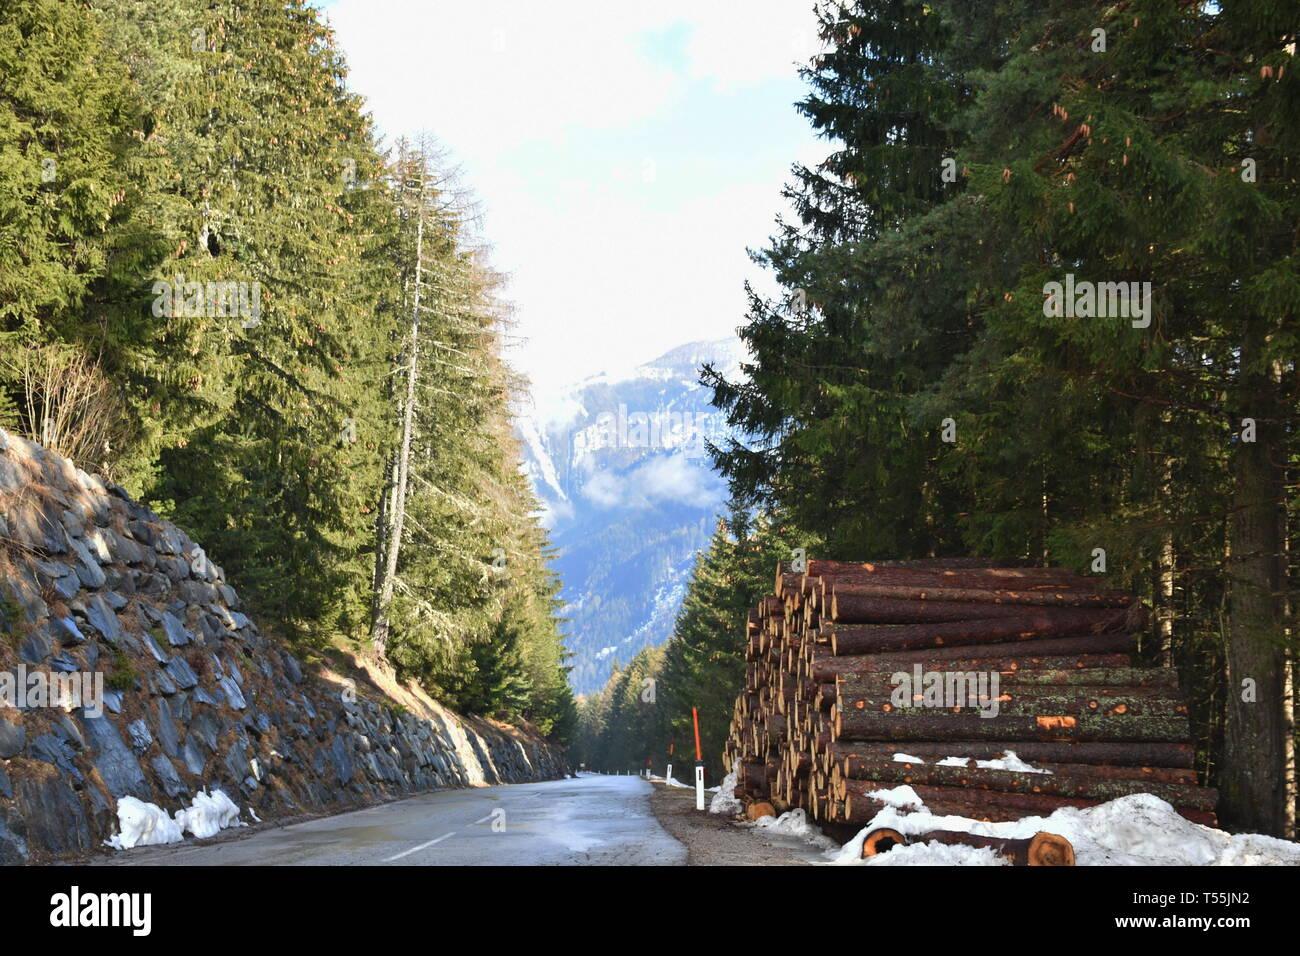 Pustertaler Höhenstraße, Winter, Wald, Holz, Hozstoß, geschlägert, Baum, Wald, Straße, Bergstraße, Lienz, Leisach, Osttirol, Lienzer Dolomiten, Tirol, - Stock Image